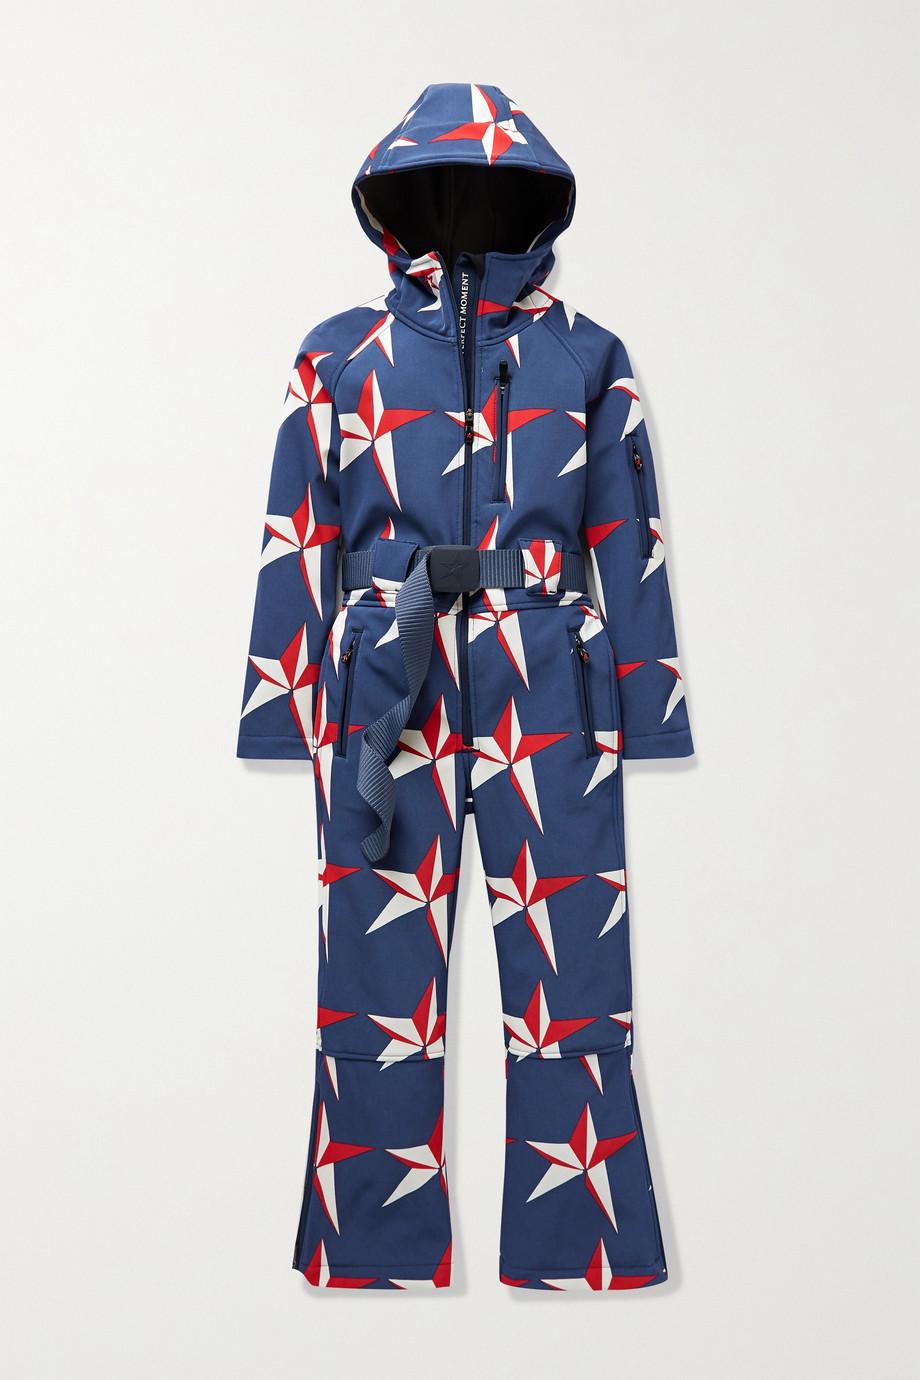 Perfect Moment Kids 【6 - 12 岁】连帽配腰带印花连体滑雪服